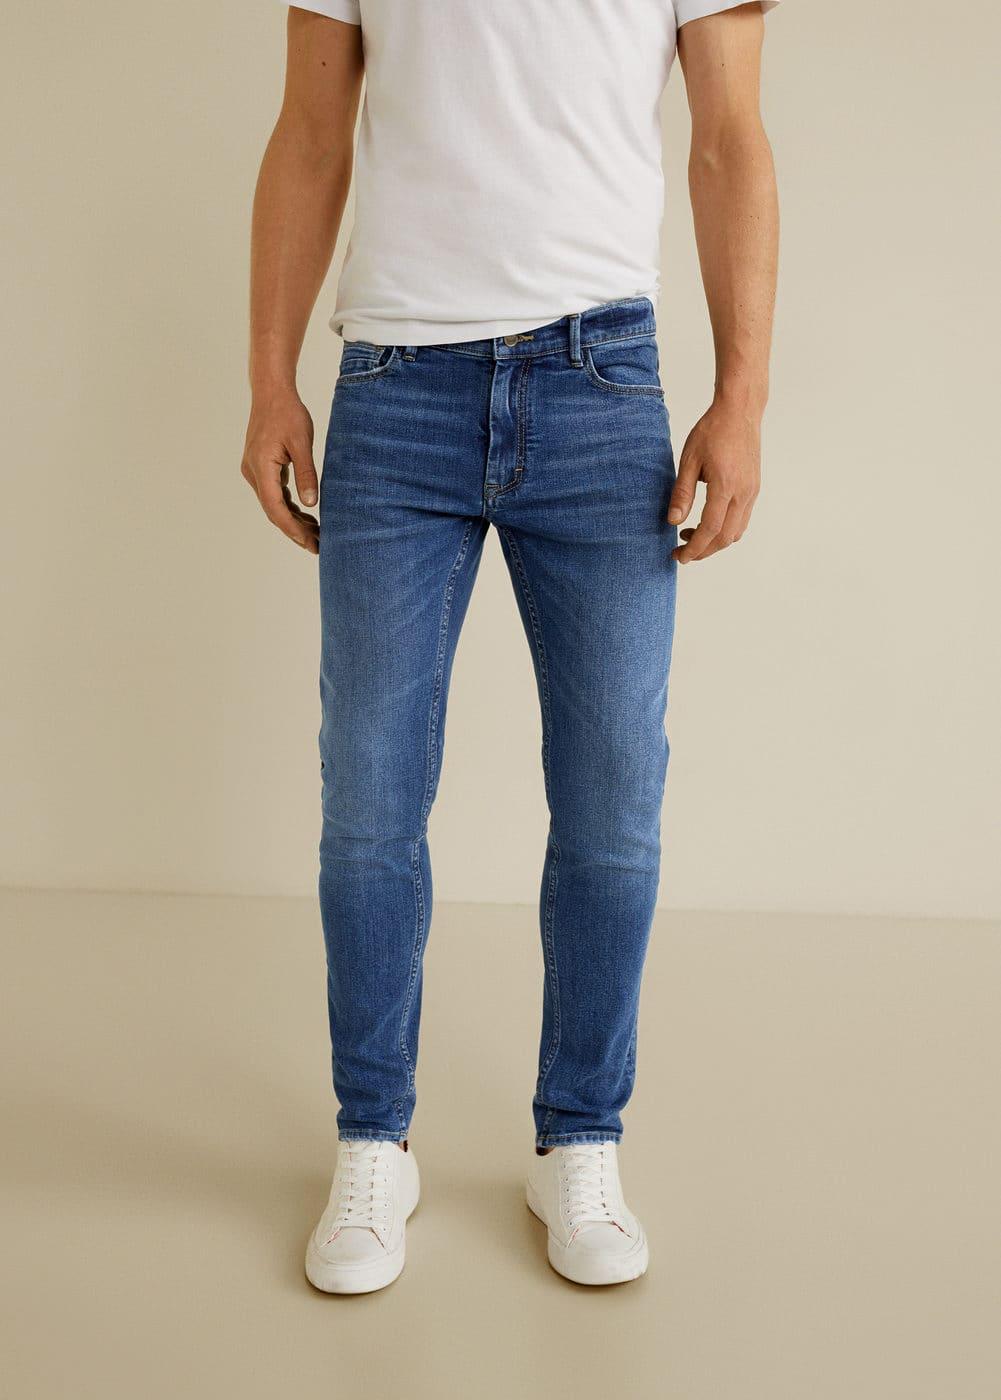 h-jude5:jeans jude skinny lavado medio